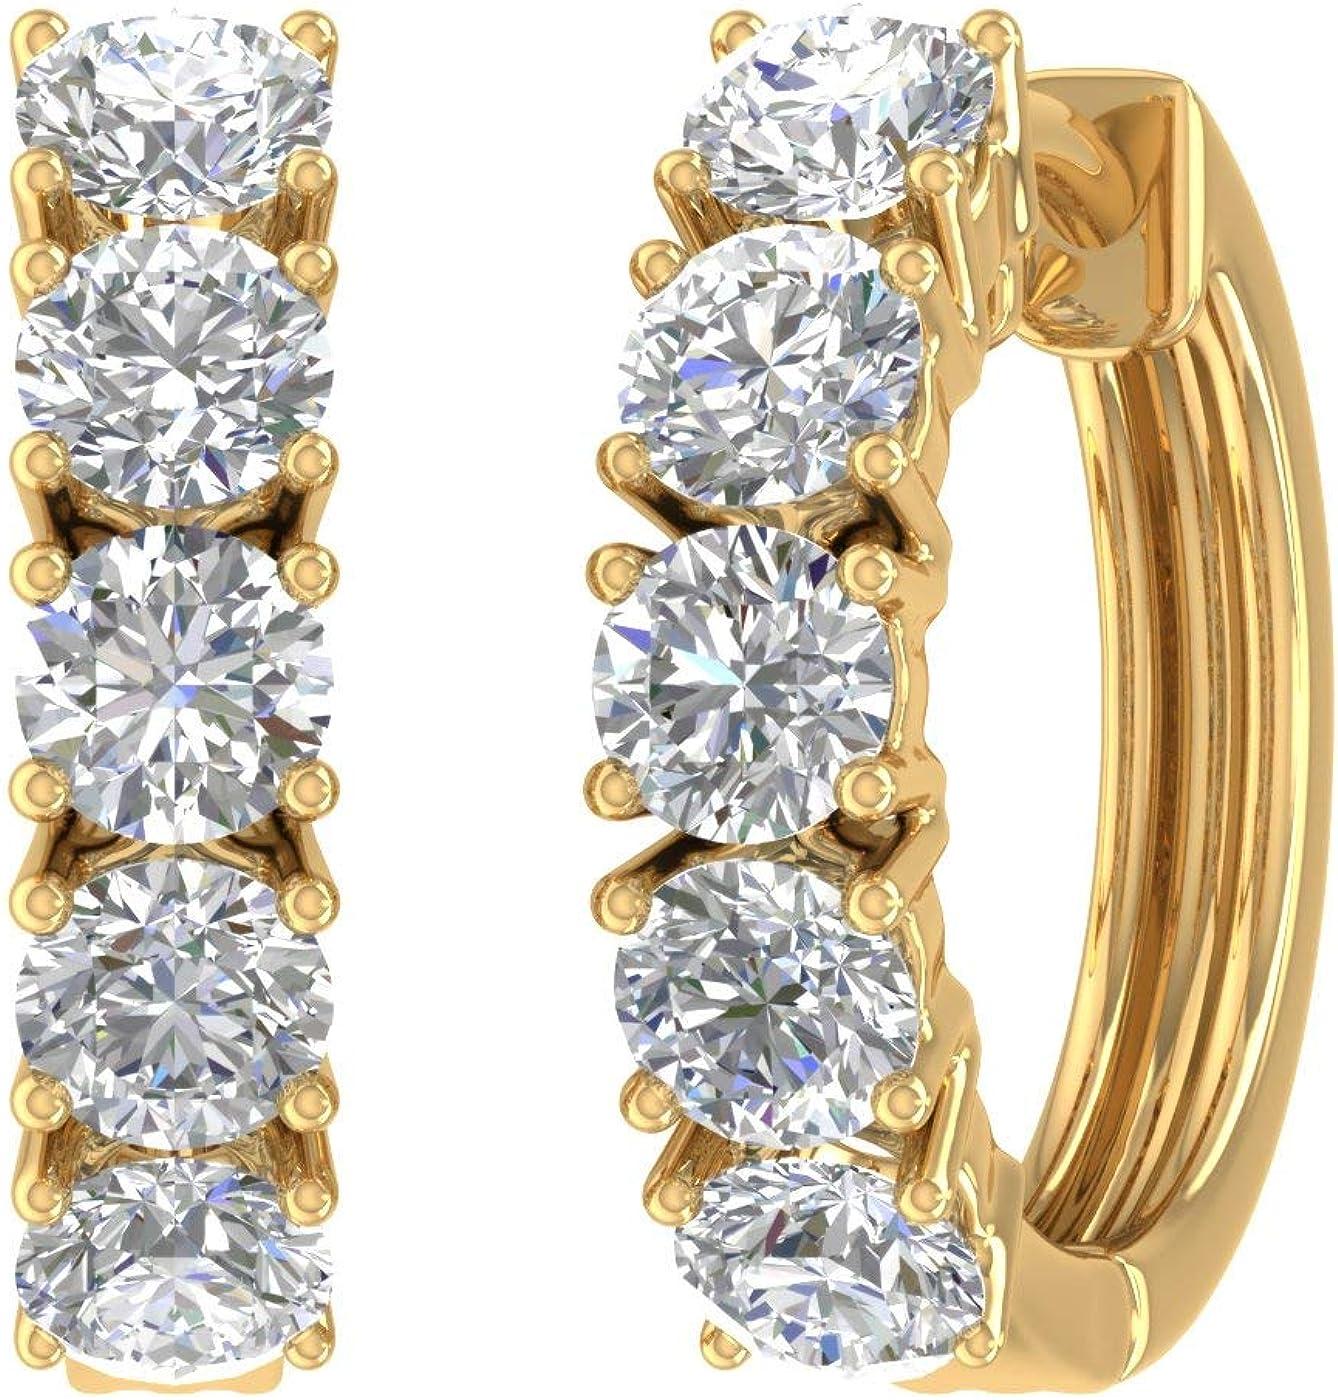 1 Houston Mall Carat to 5 14K Gold H Popular standard Ladies Round Diamond White Huggies